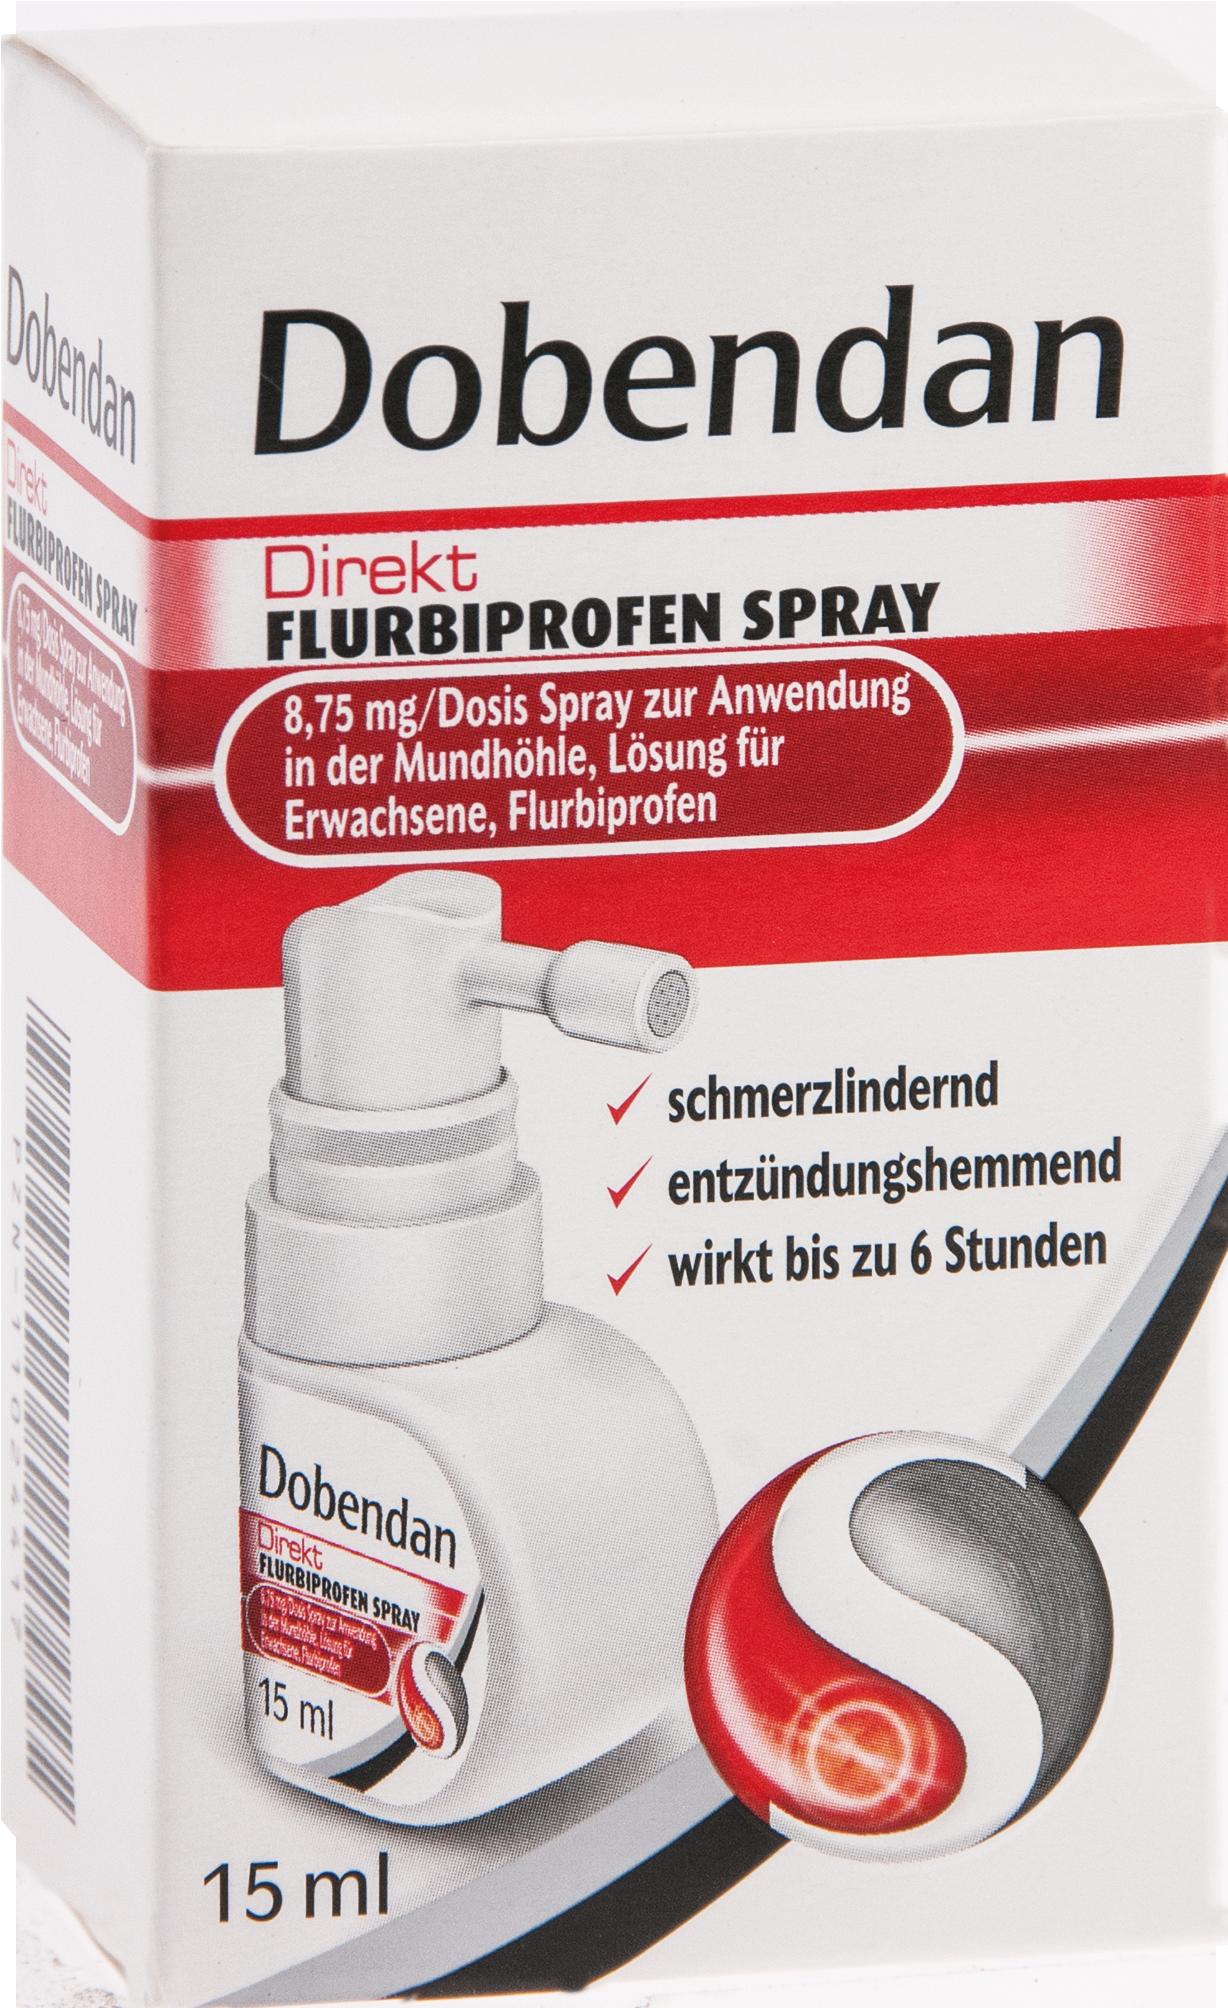 Dobendan Direkt Flurbiprofen Spray 8.75mg/Dos Mund